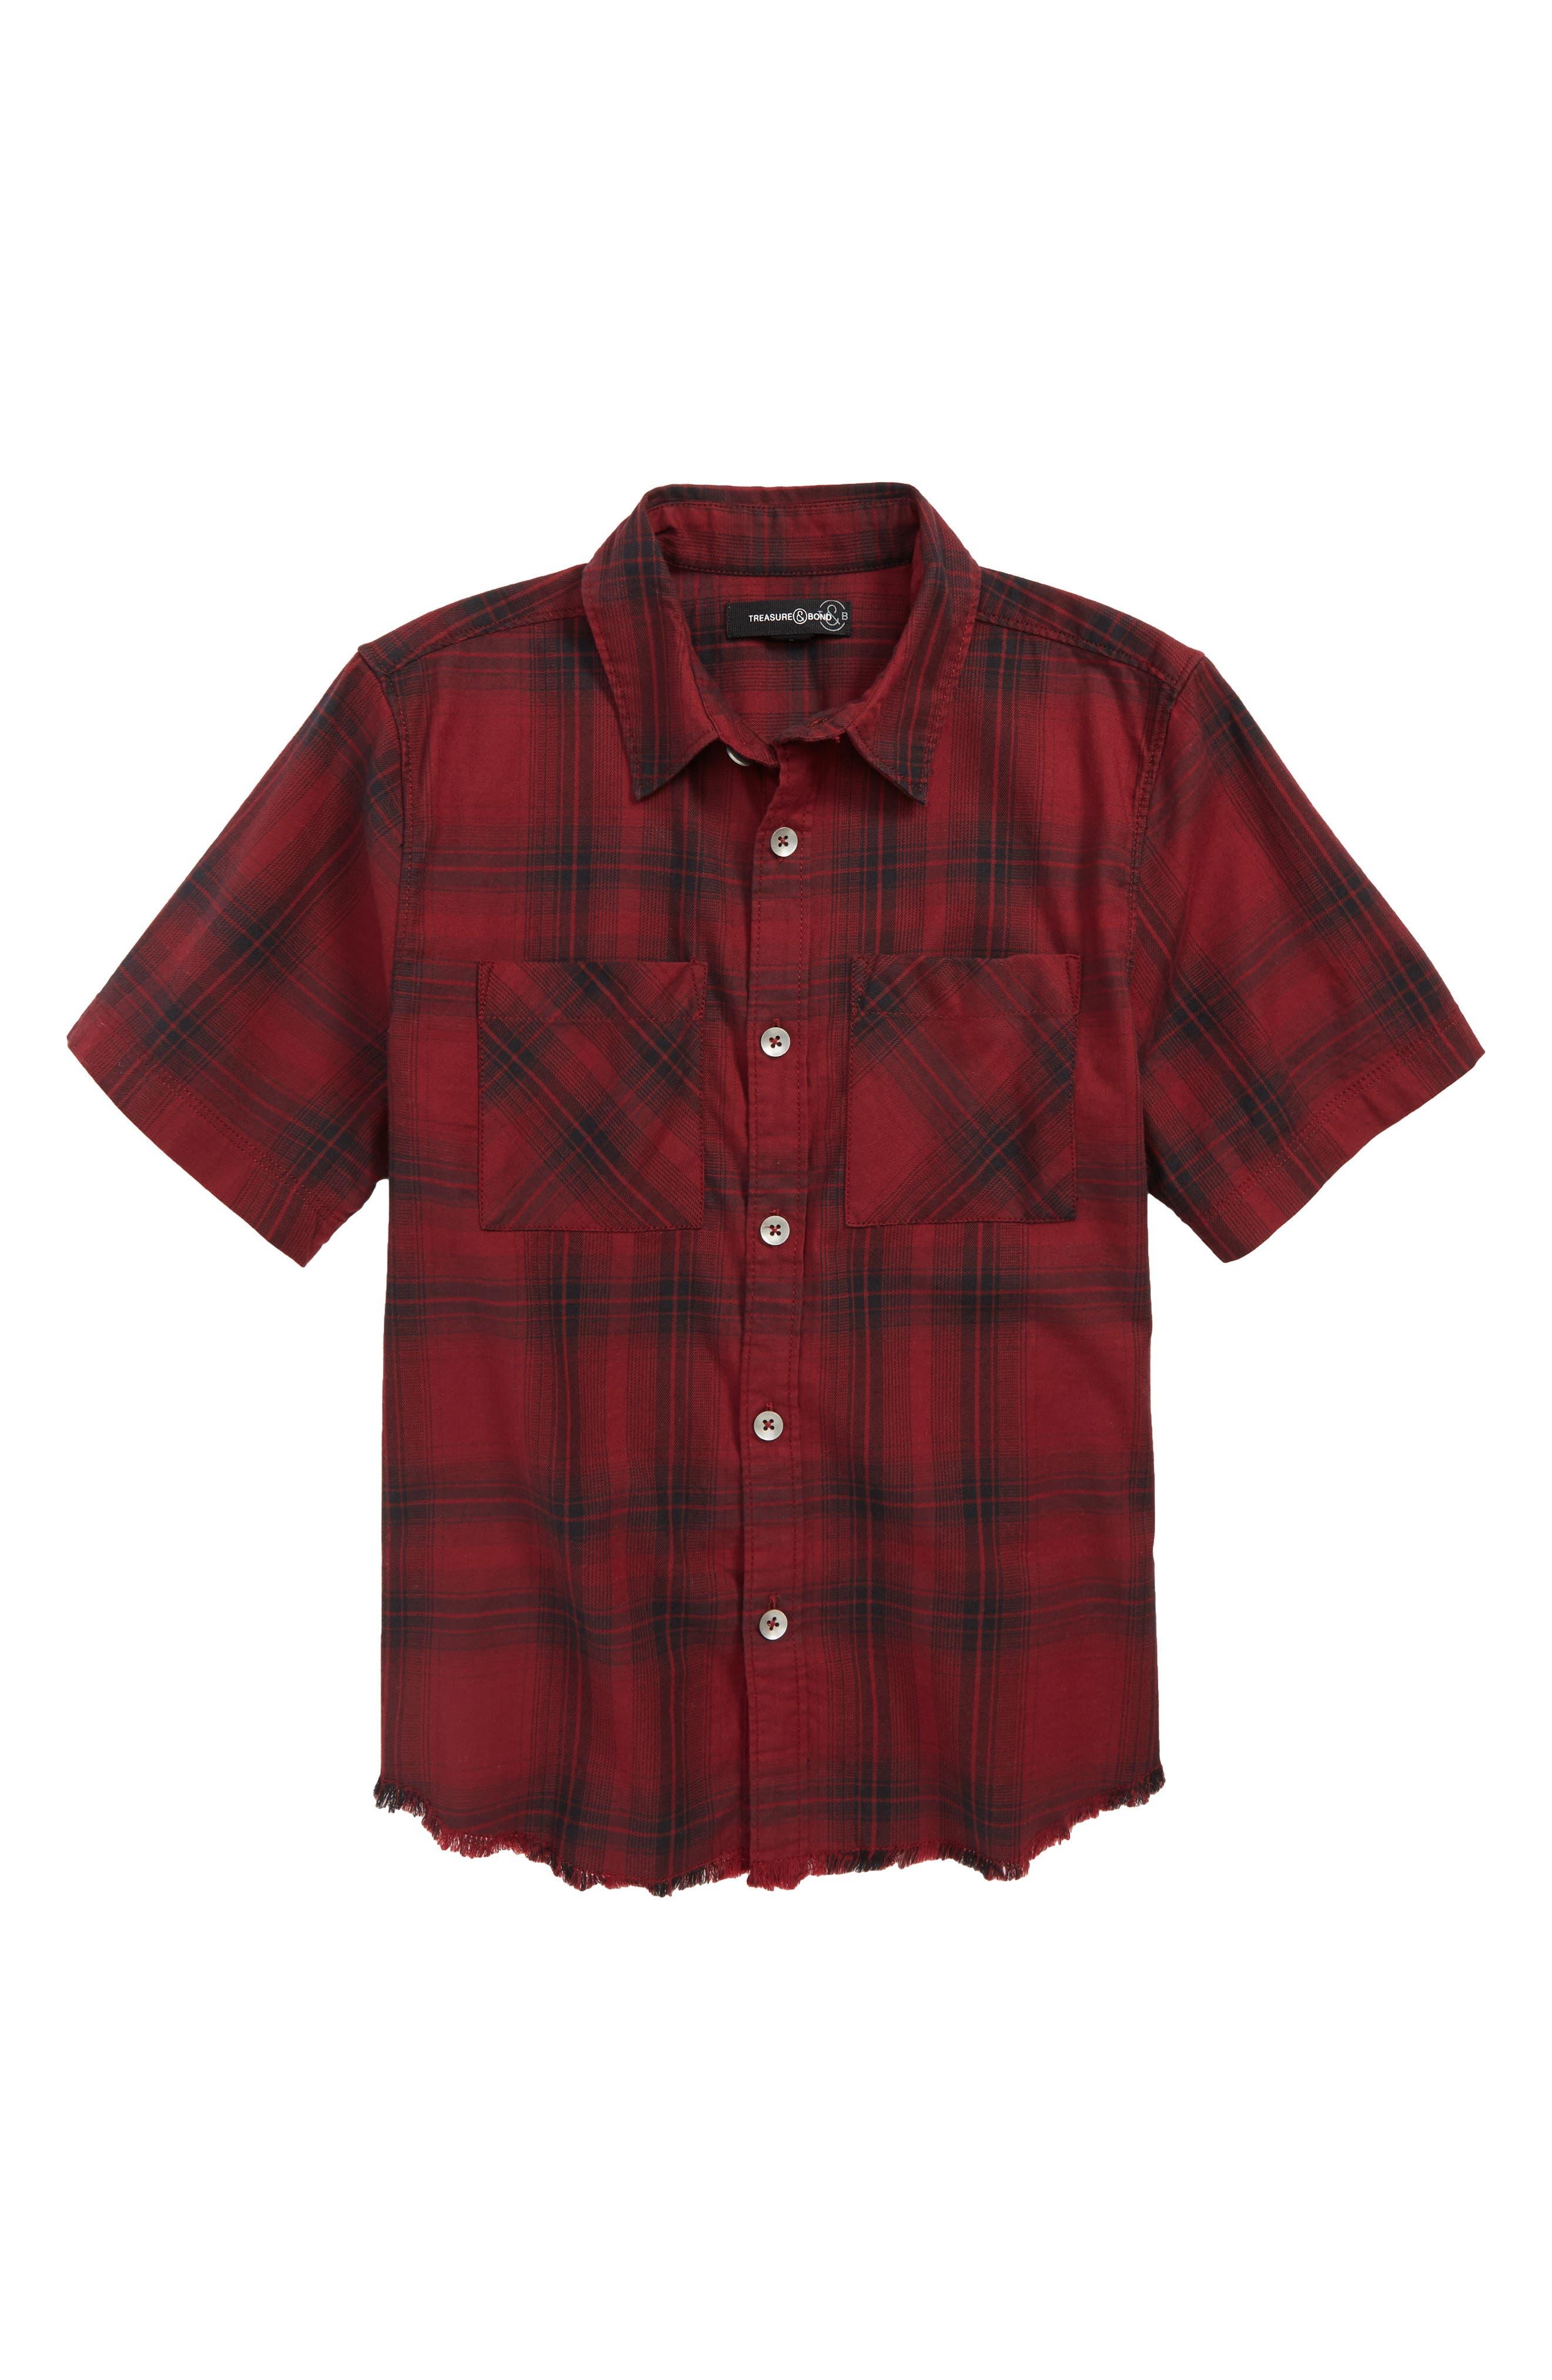 Distressed Plaid Flannel Shirt,                             Main thumbnail 1, color,                             RED GRAPE- BLACK PLAID